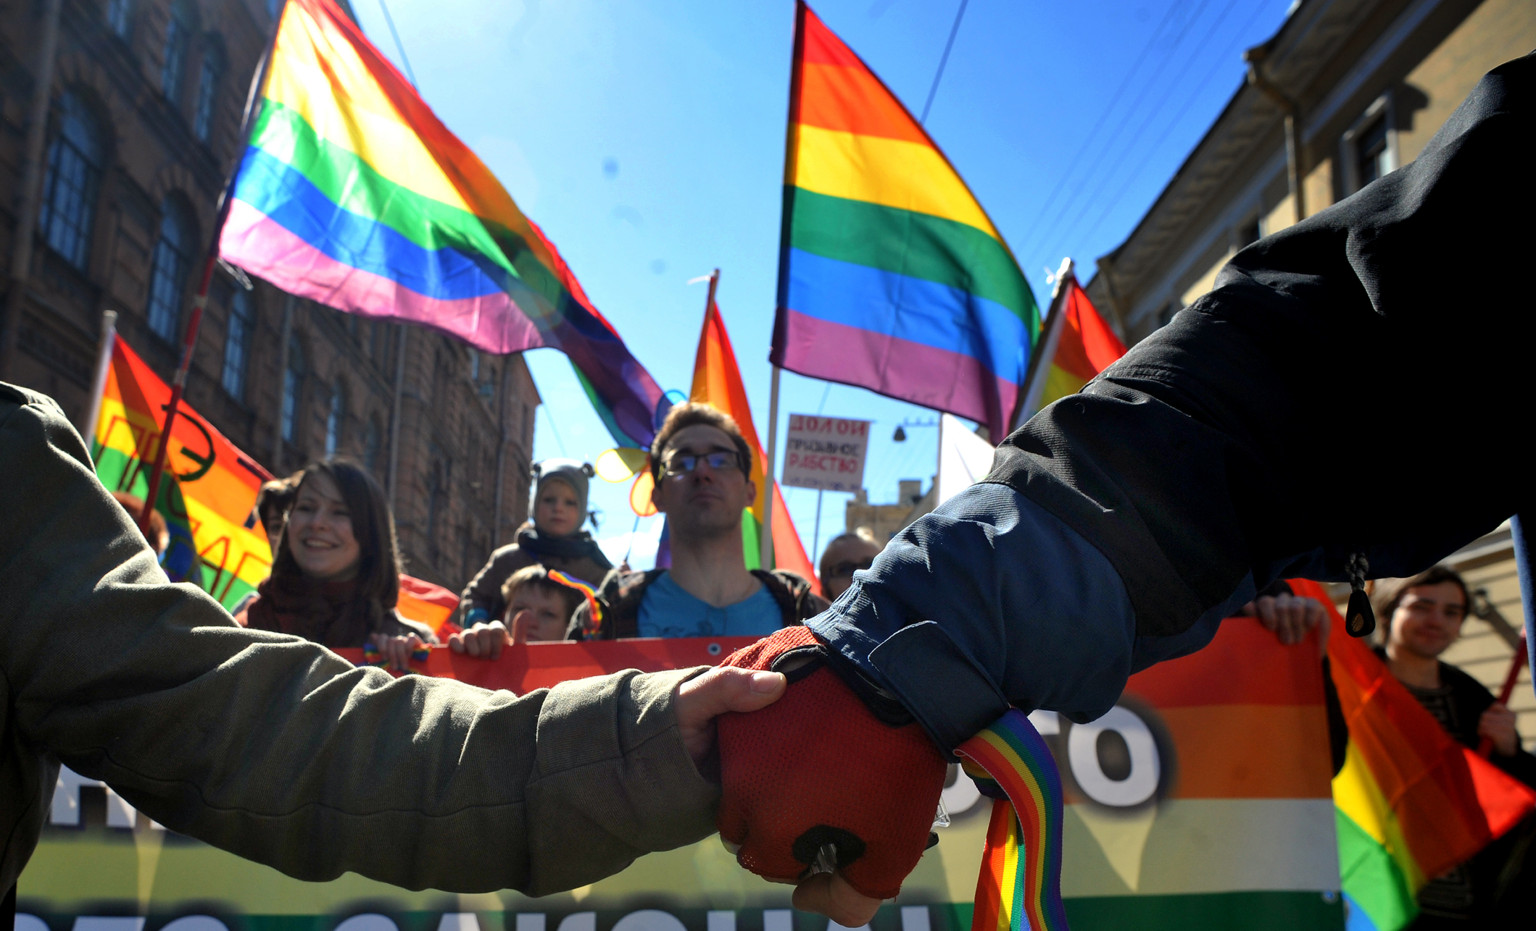 from Kingston ban gay rights